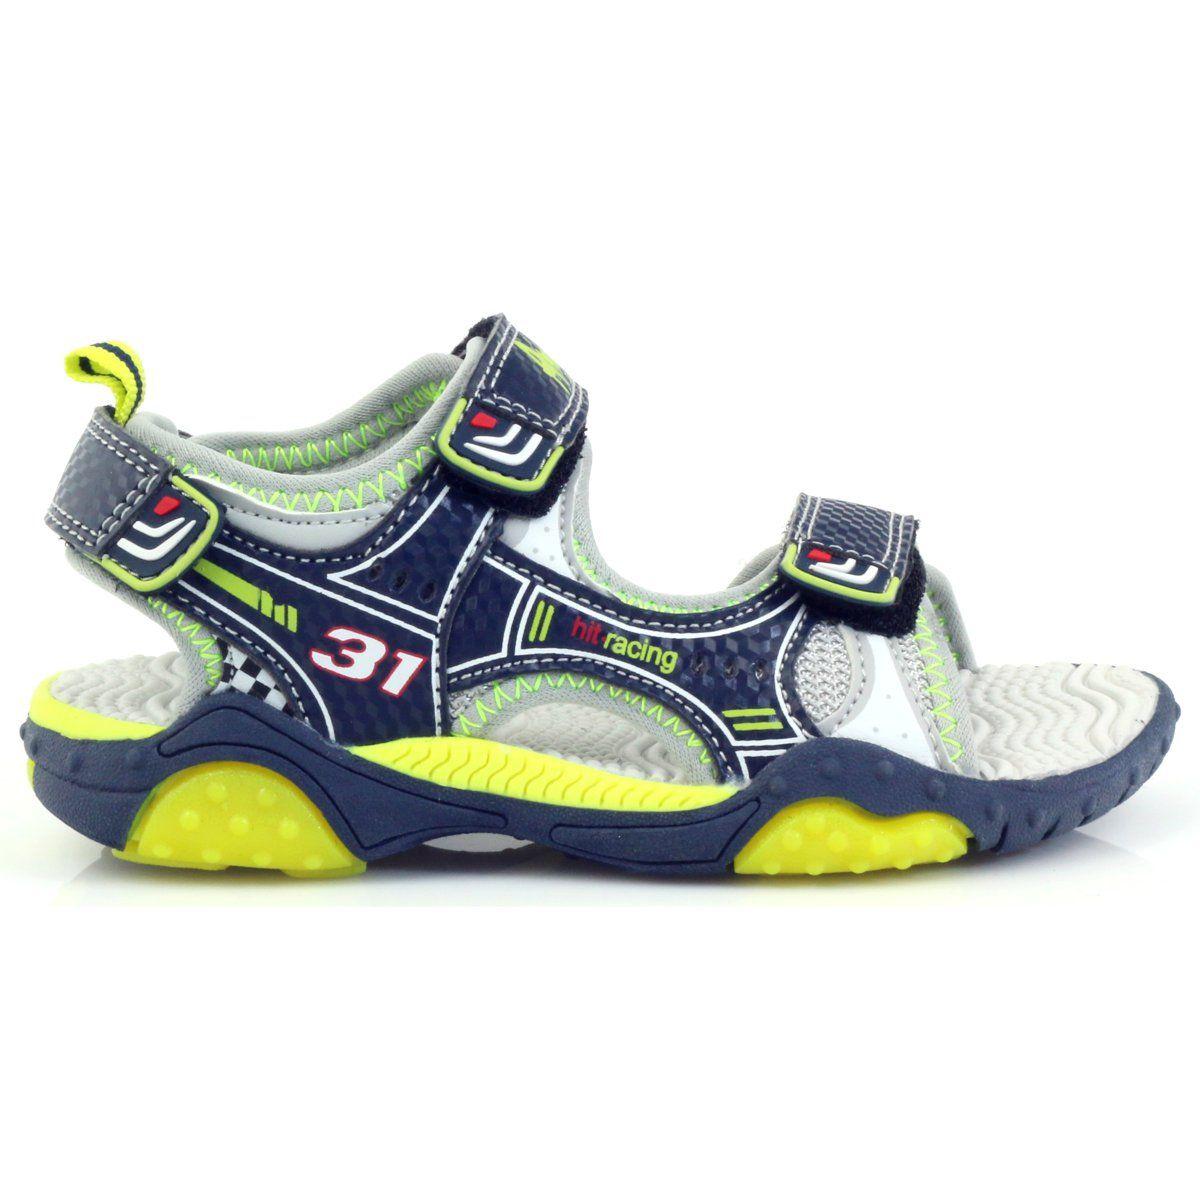 American Club Buty Dzieciece Sandalki Swiecace American 1702 Granatowe Zielone Szare Kids Sandals Shoes Saucony Sneaker